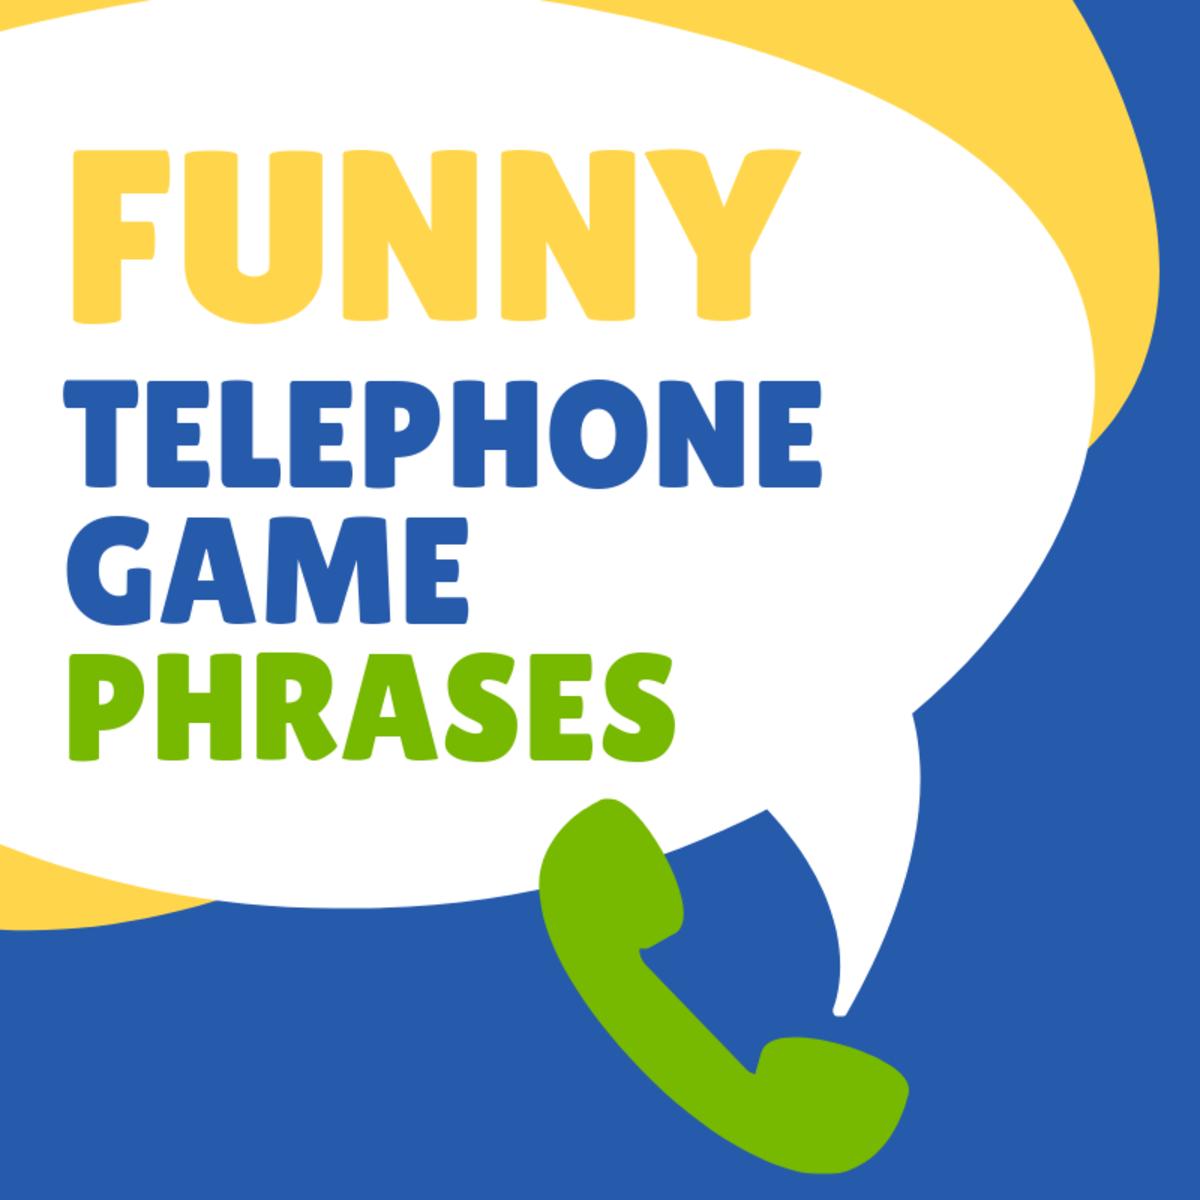 drawing game like telephone 45 Funny Telephone Game Phrases HobbyLark